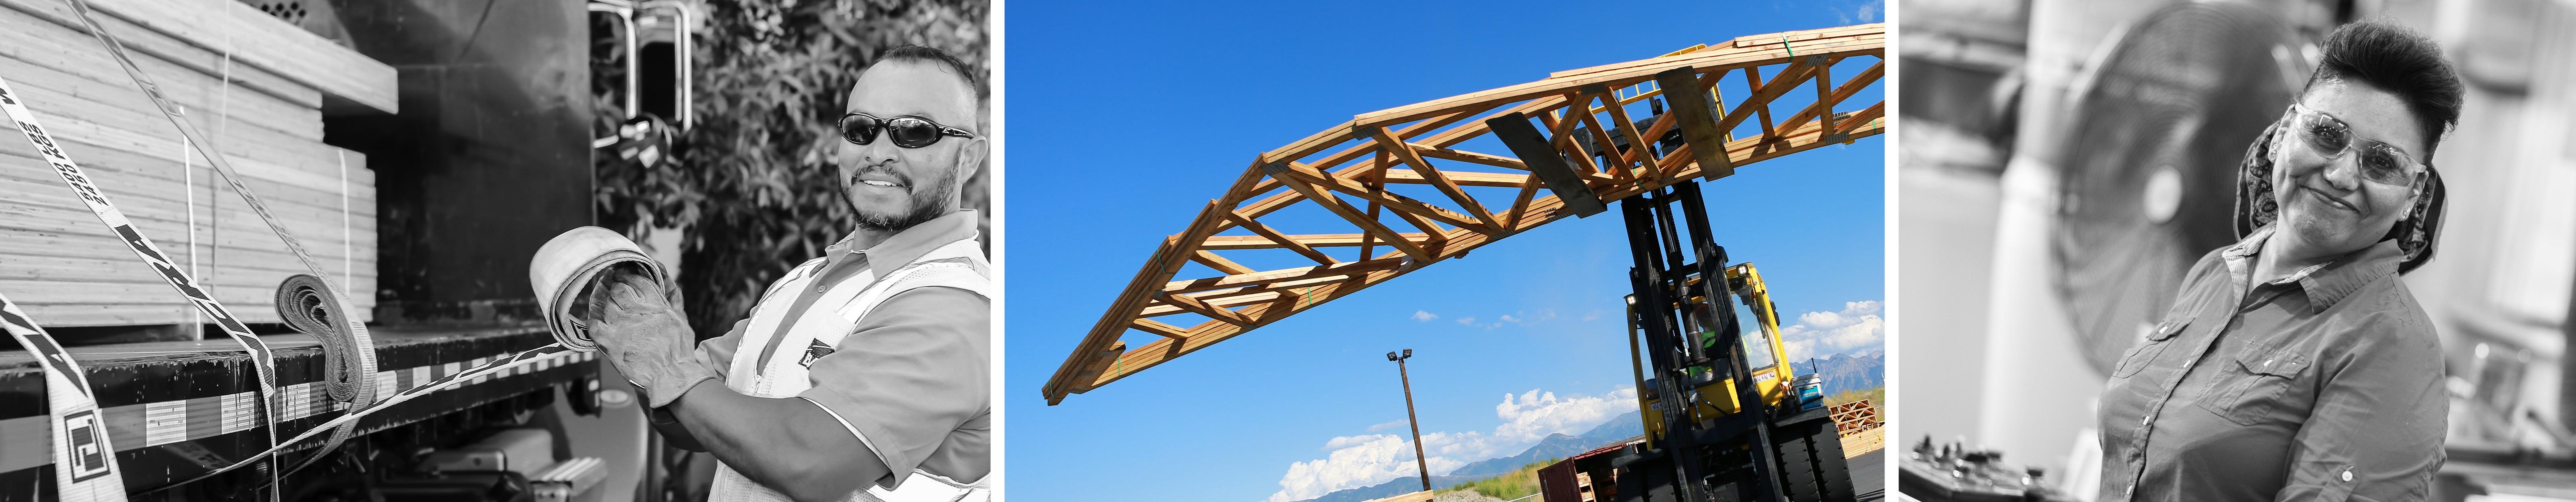 BMC - Building Materials and Construction Solutions   LinkedIn